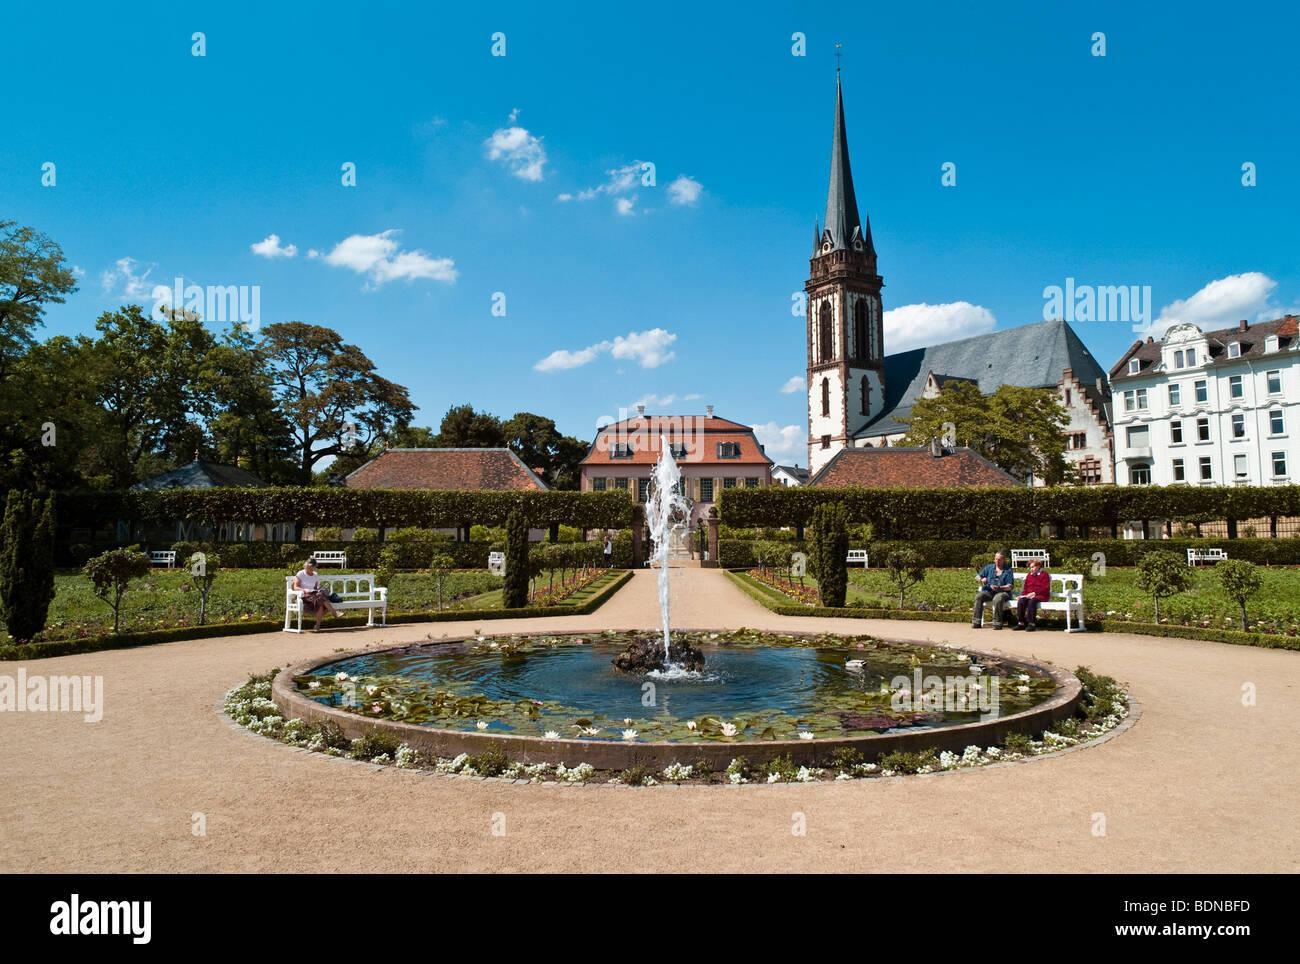 Prinz Georg Garten Garden In The Back The St Elizabeth Church